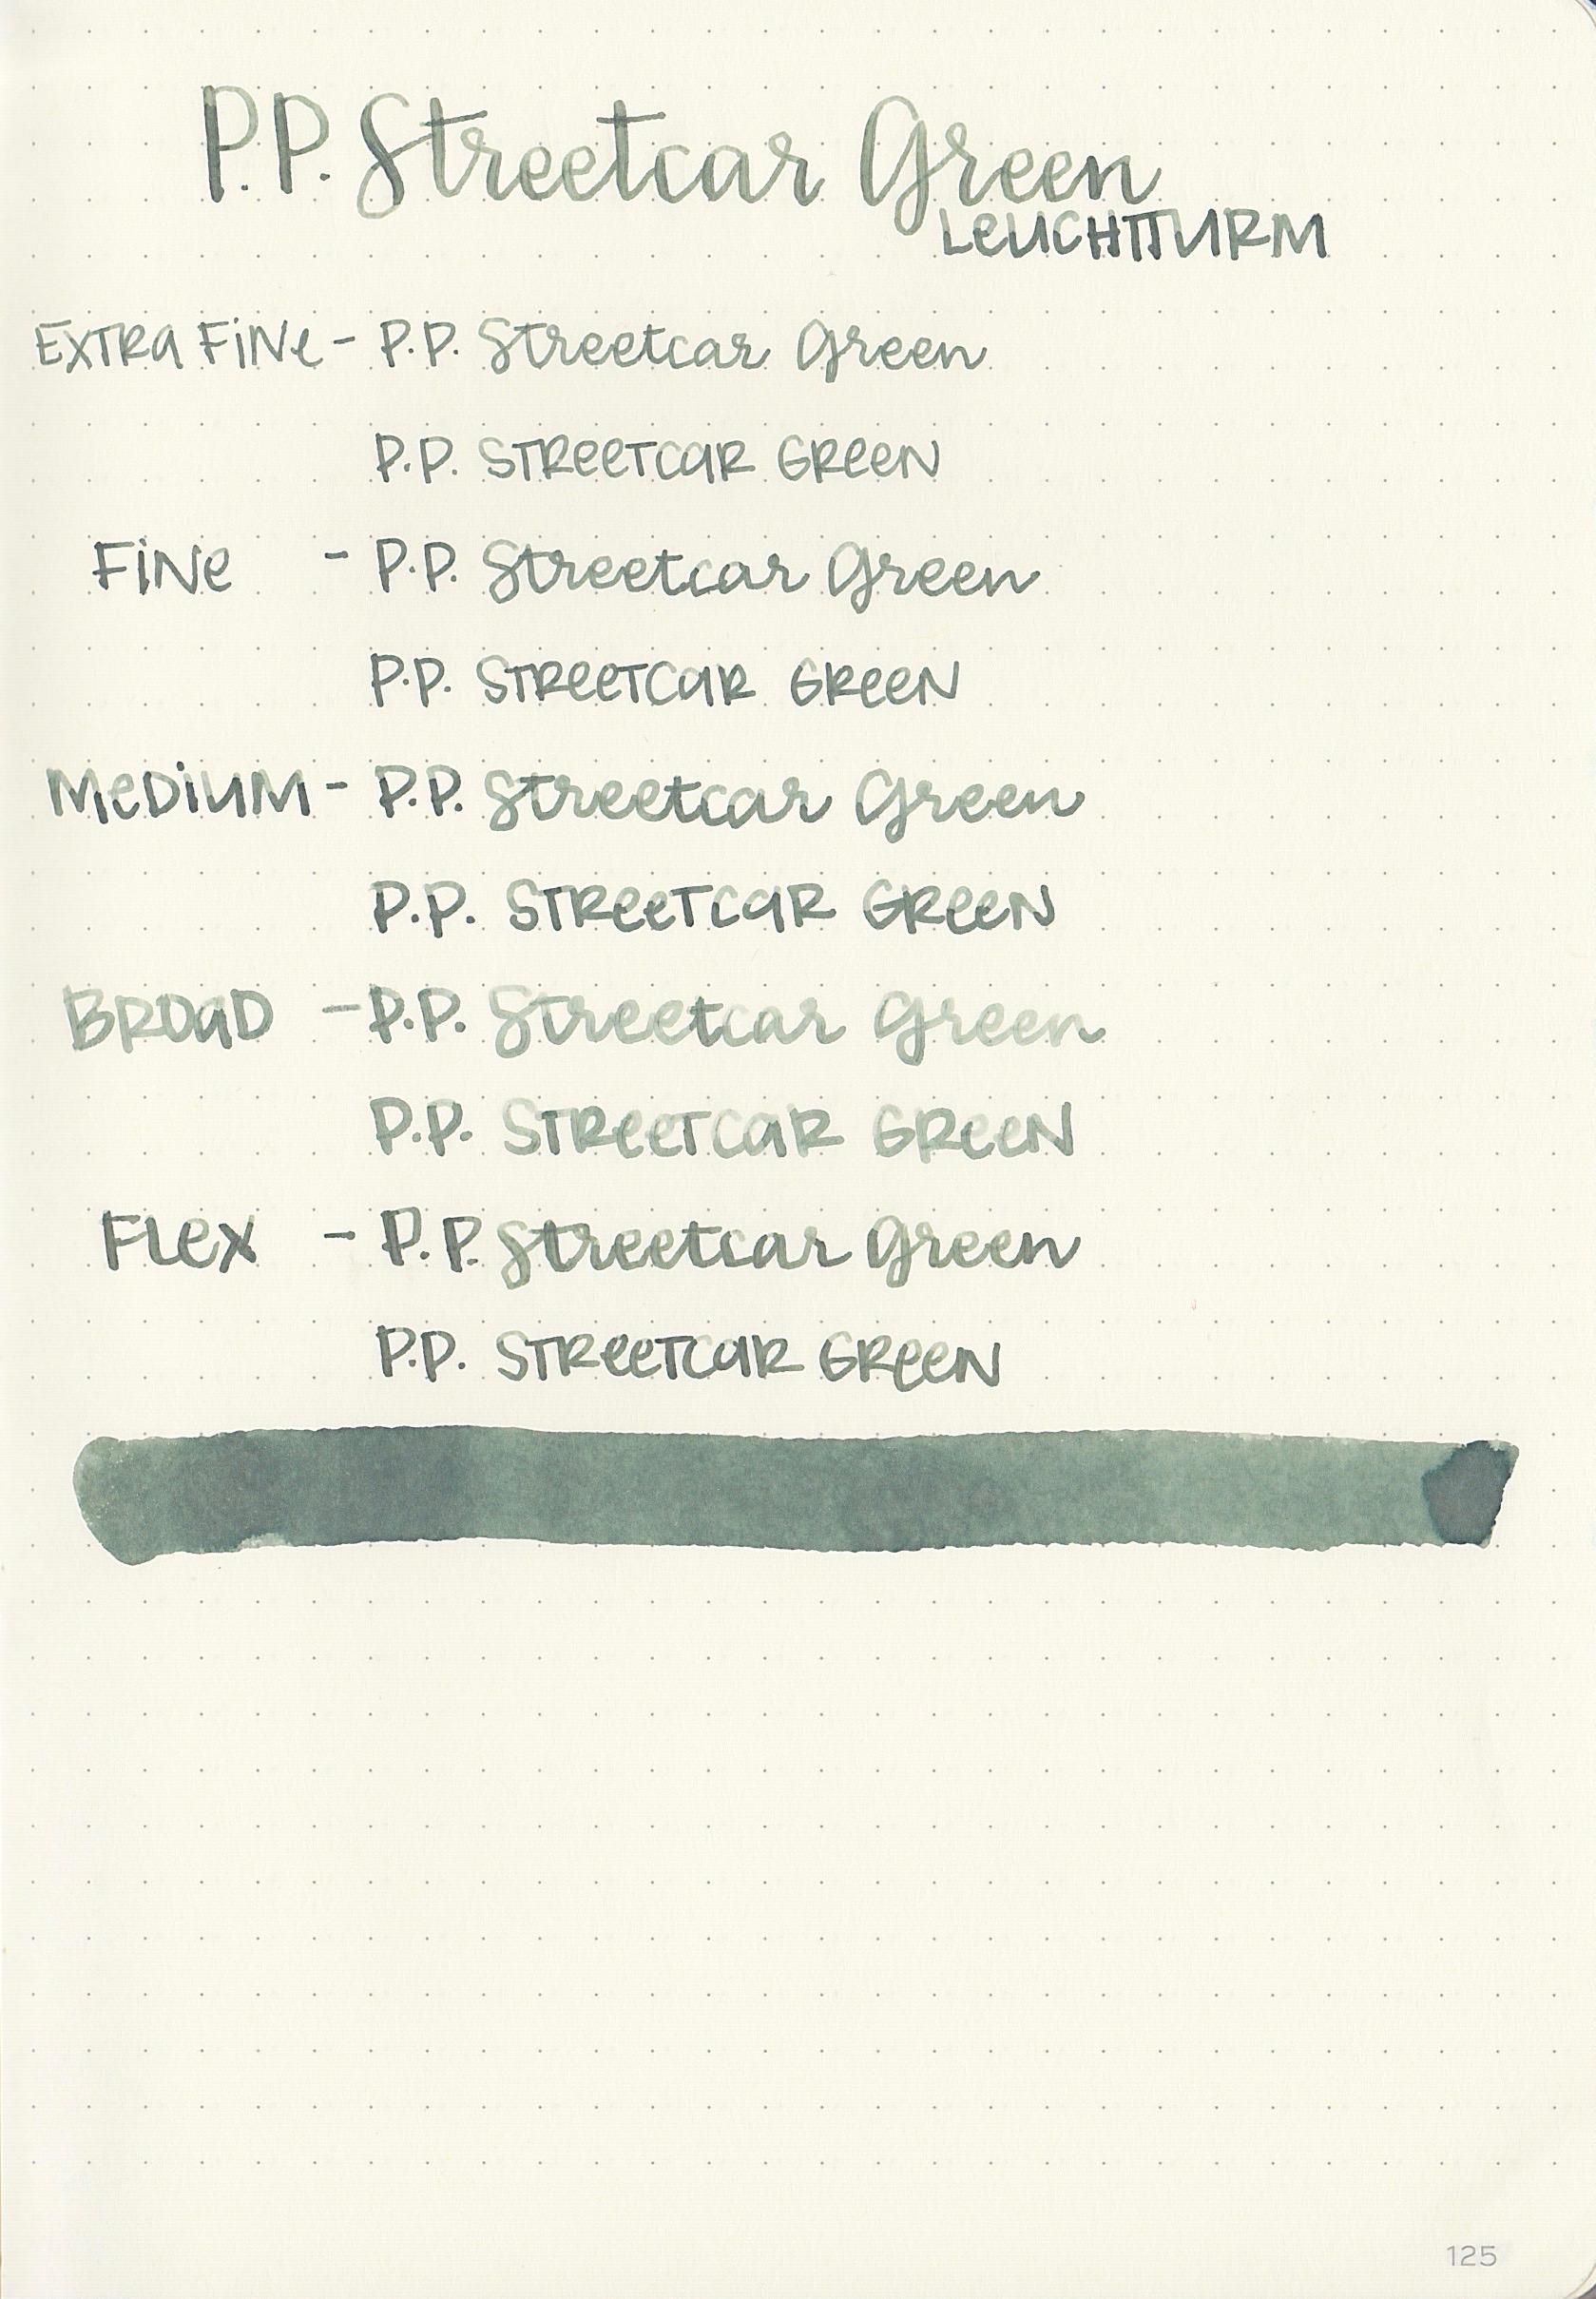 PPStreetcarGreen - 16.jpg